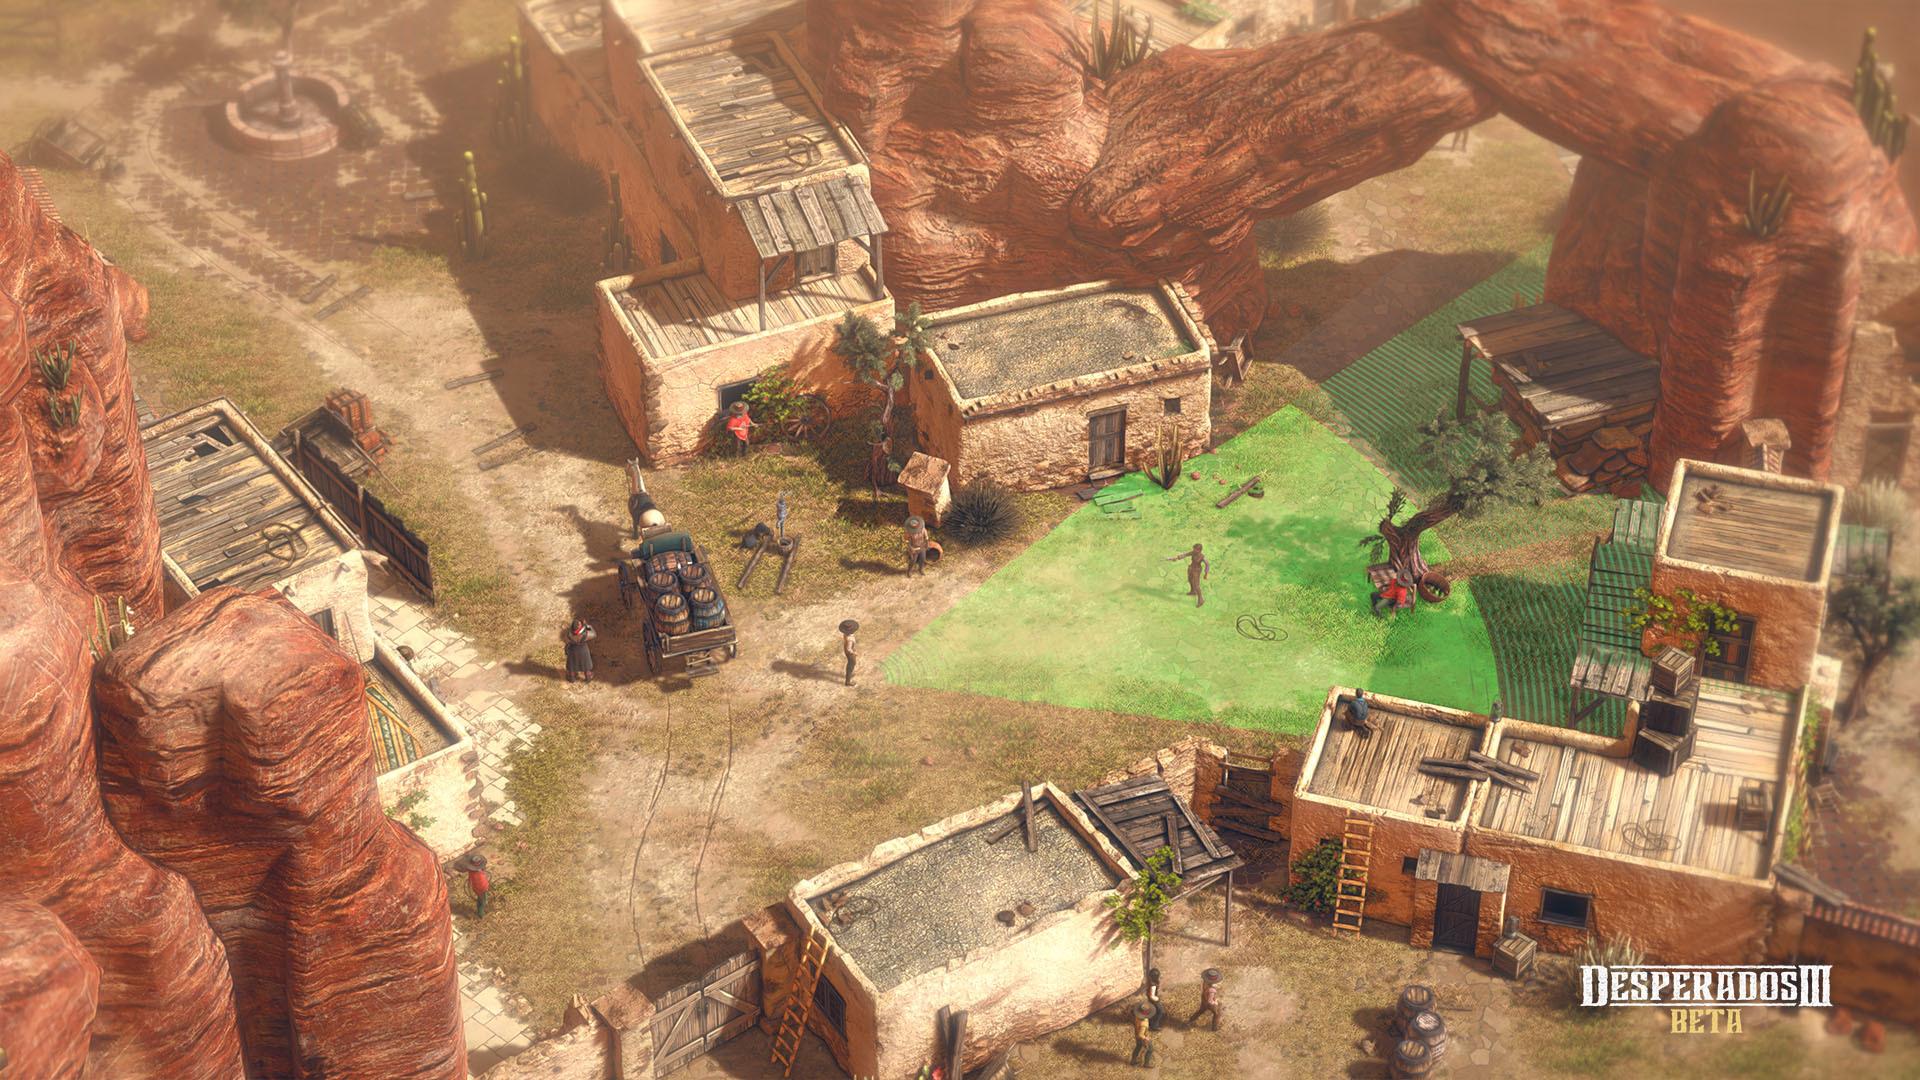 Desperados Iii Trailer Shows In Game Scenario Using Miniatures